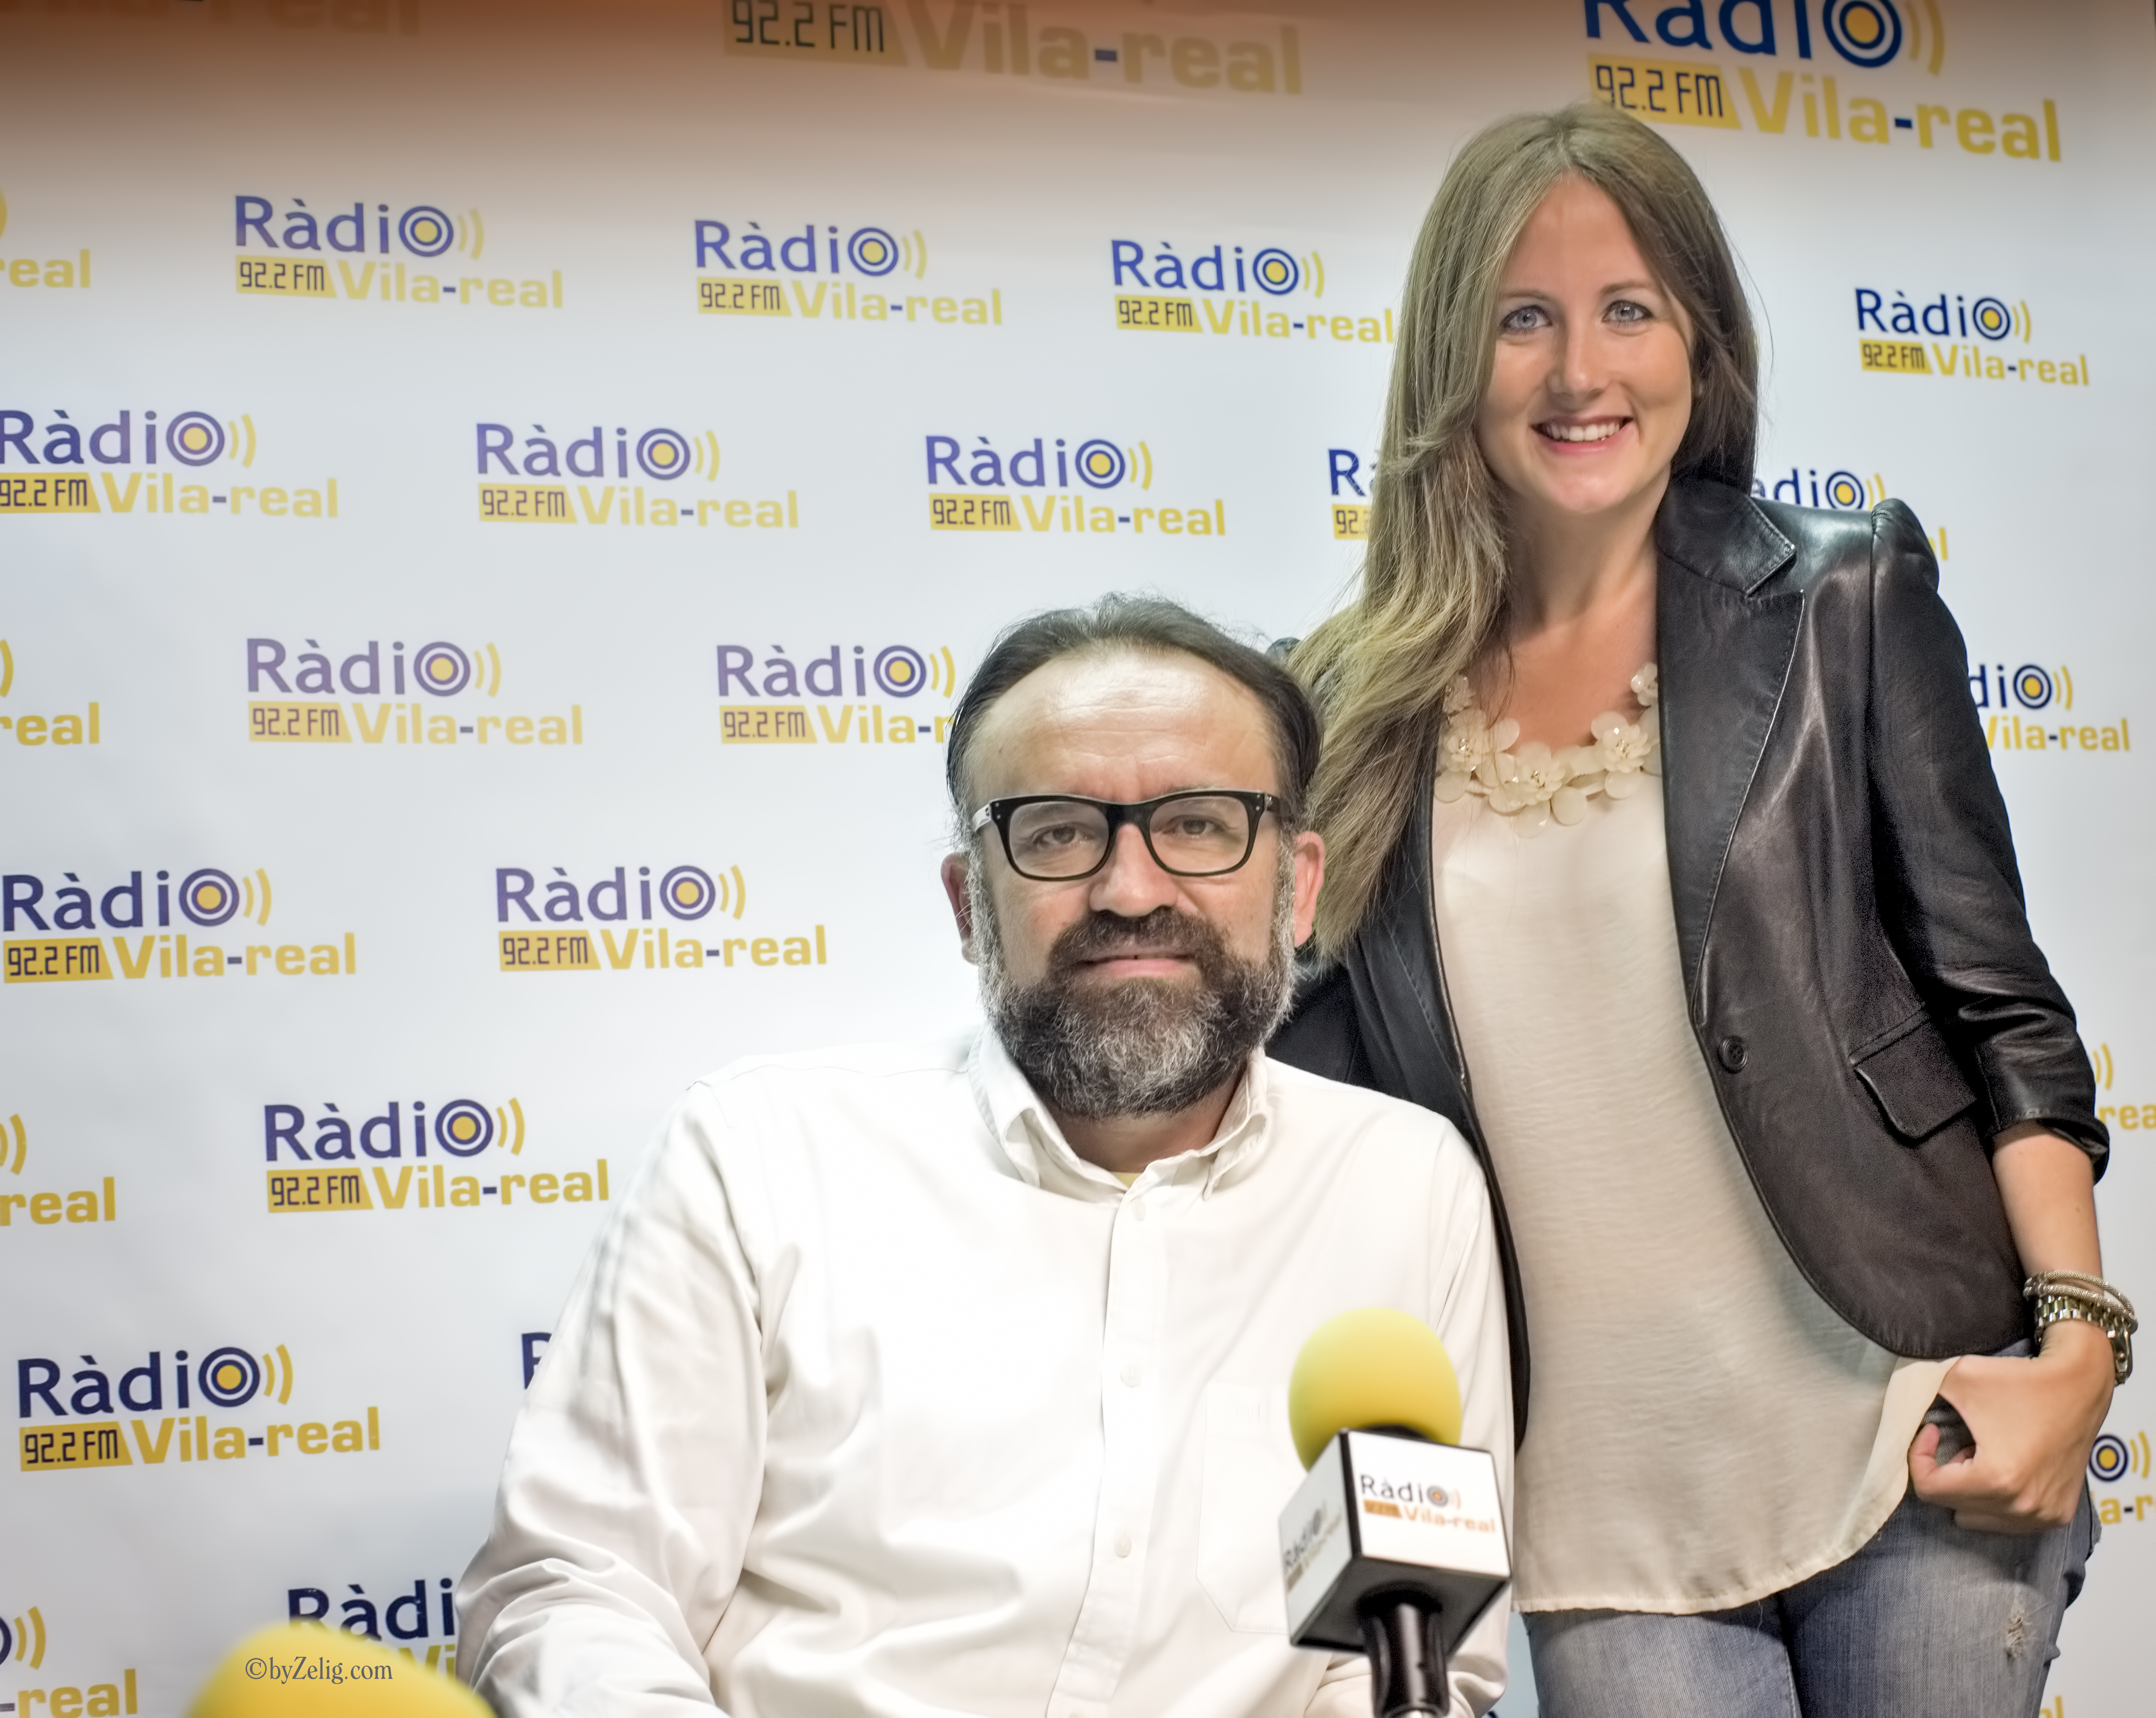 Esports Radio Vila-real. Programa del 13 de febrero de 2017